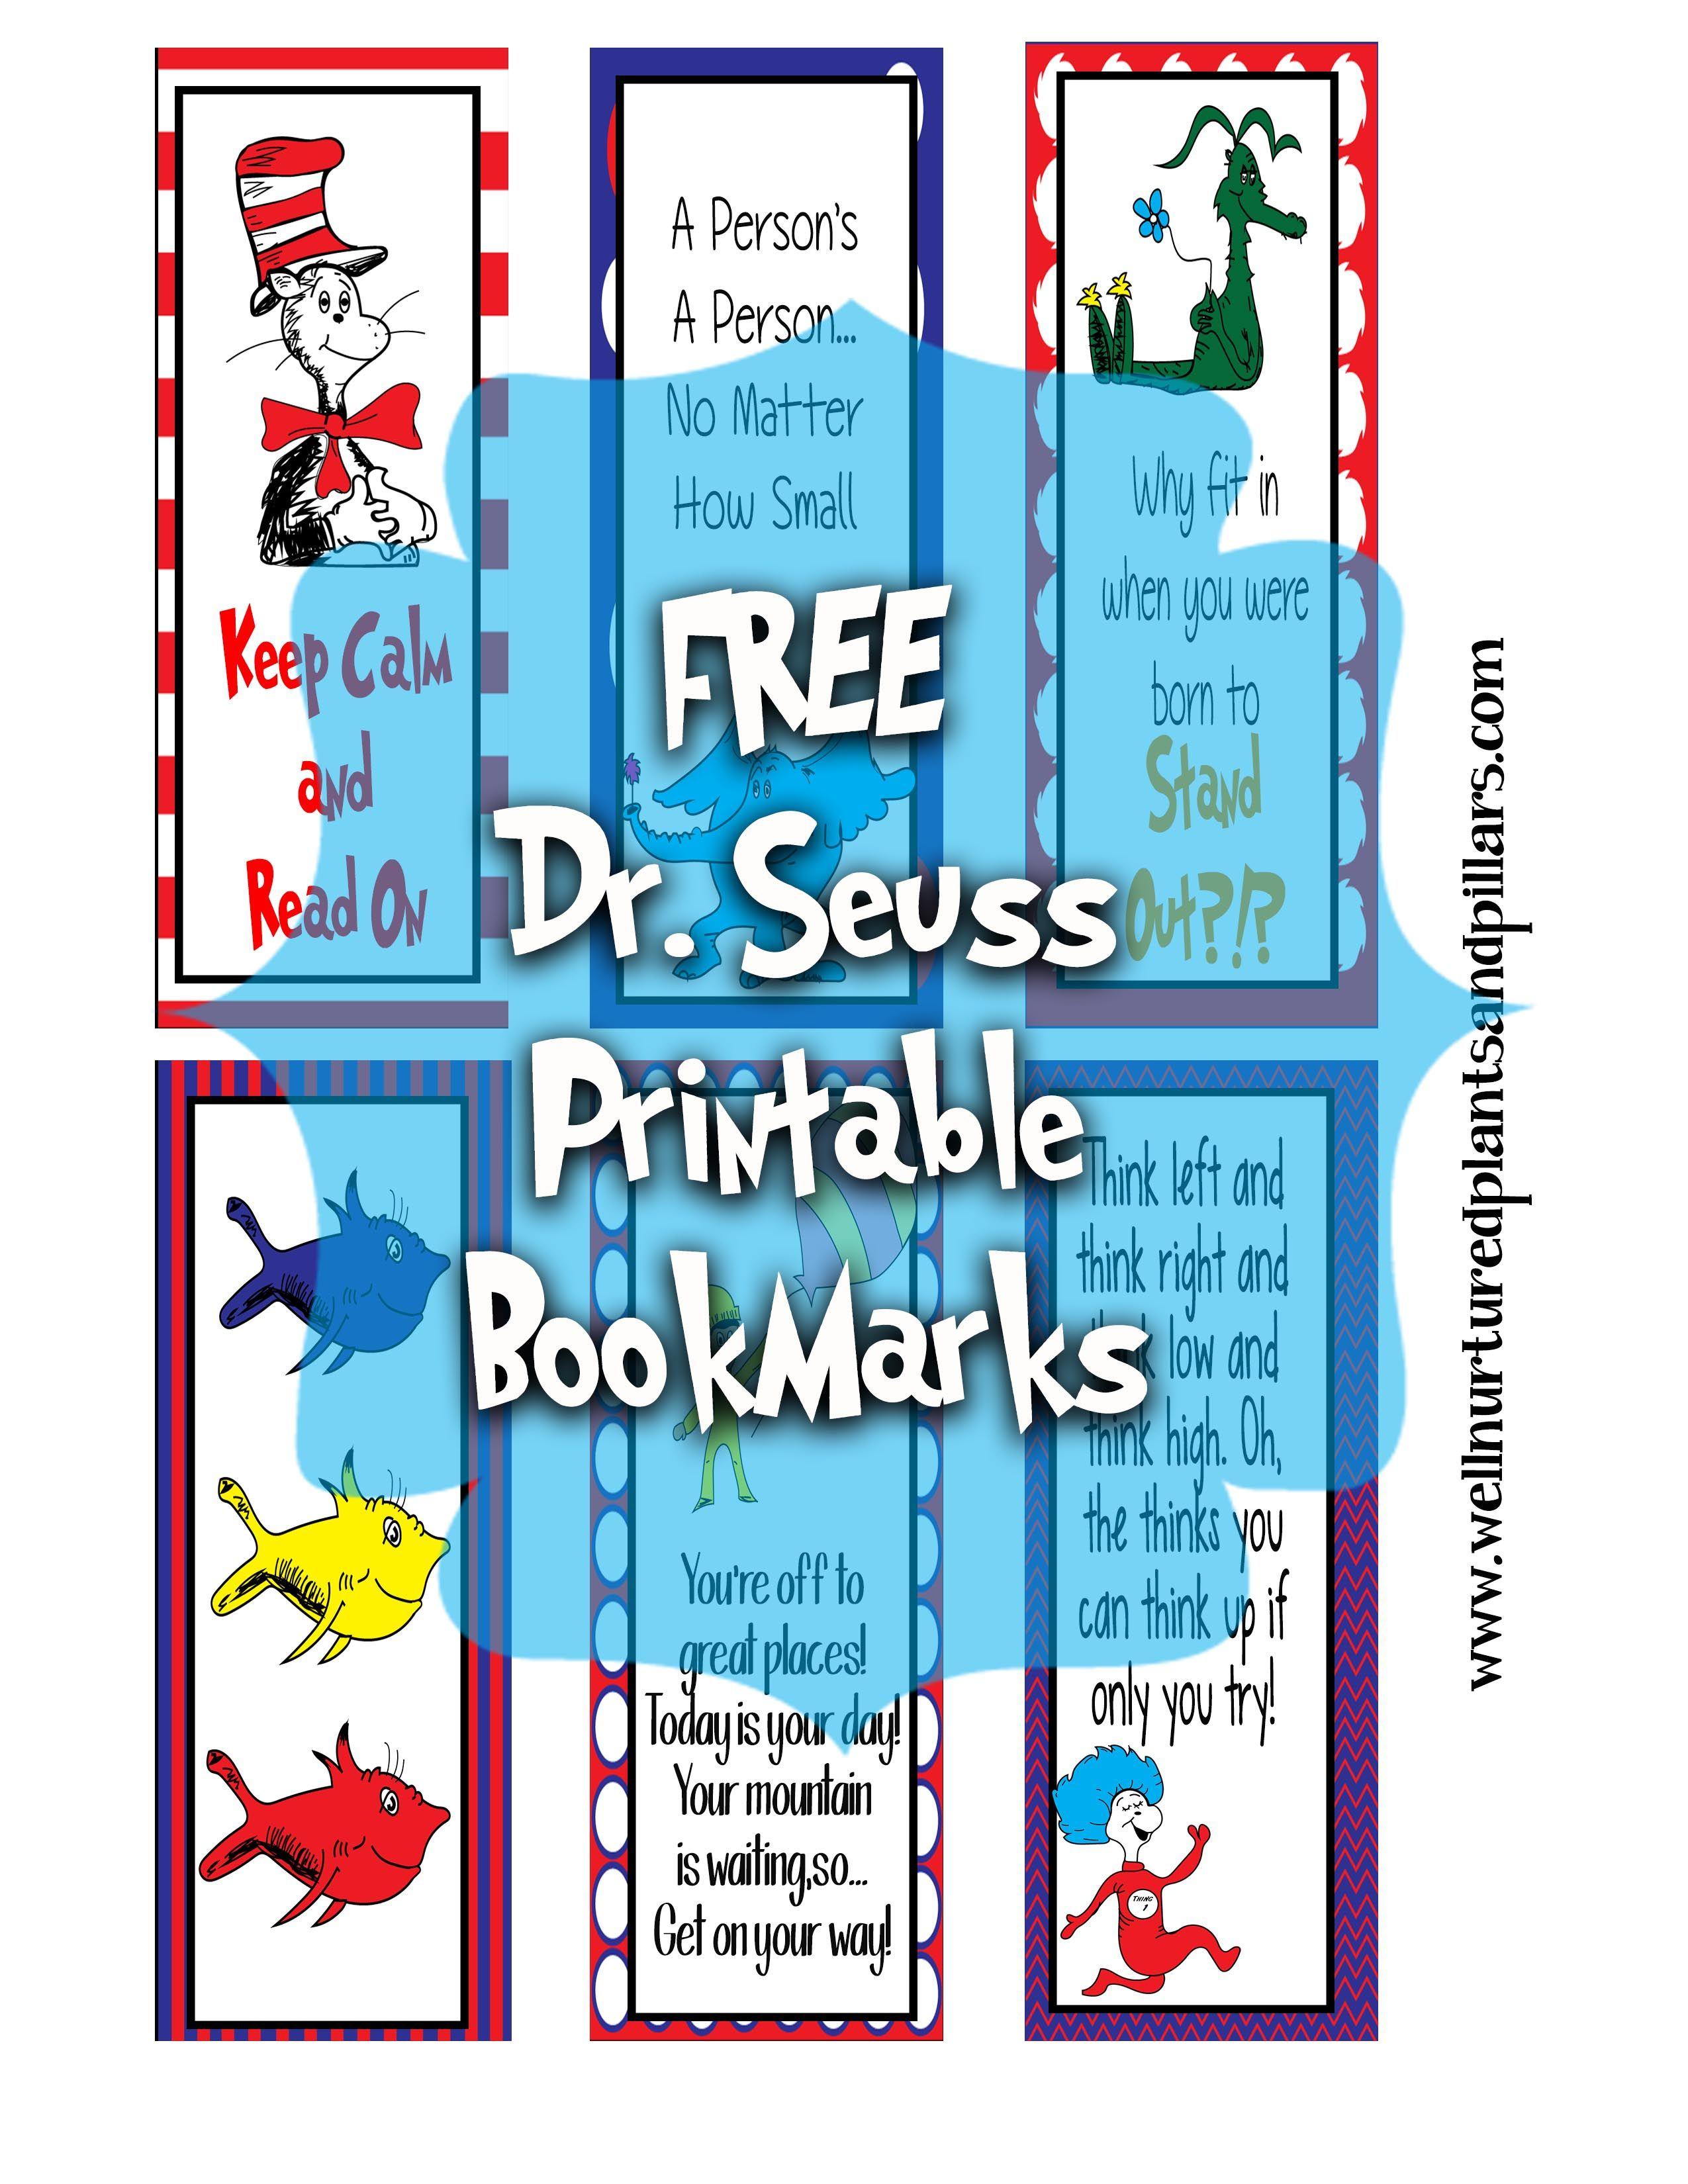 Free Printable Dr. Seuss Bookmarks | Free Printables For - Free Printable Baby Bookmarks